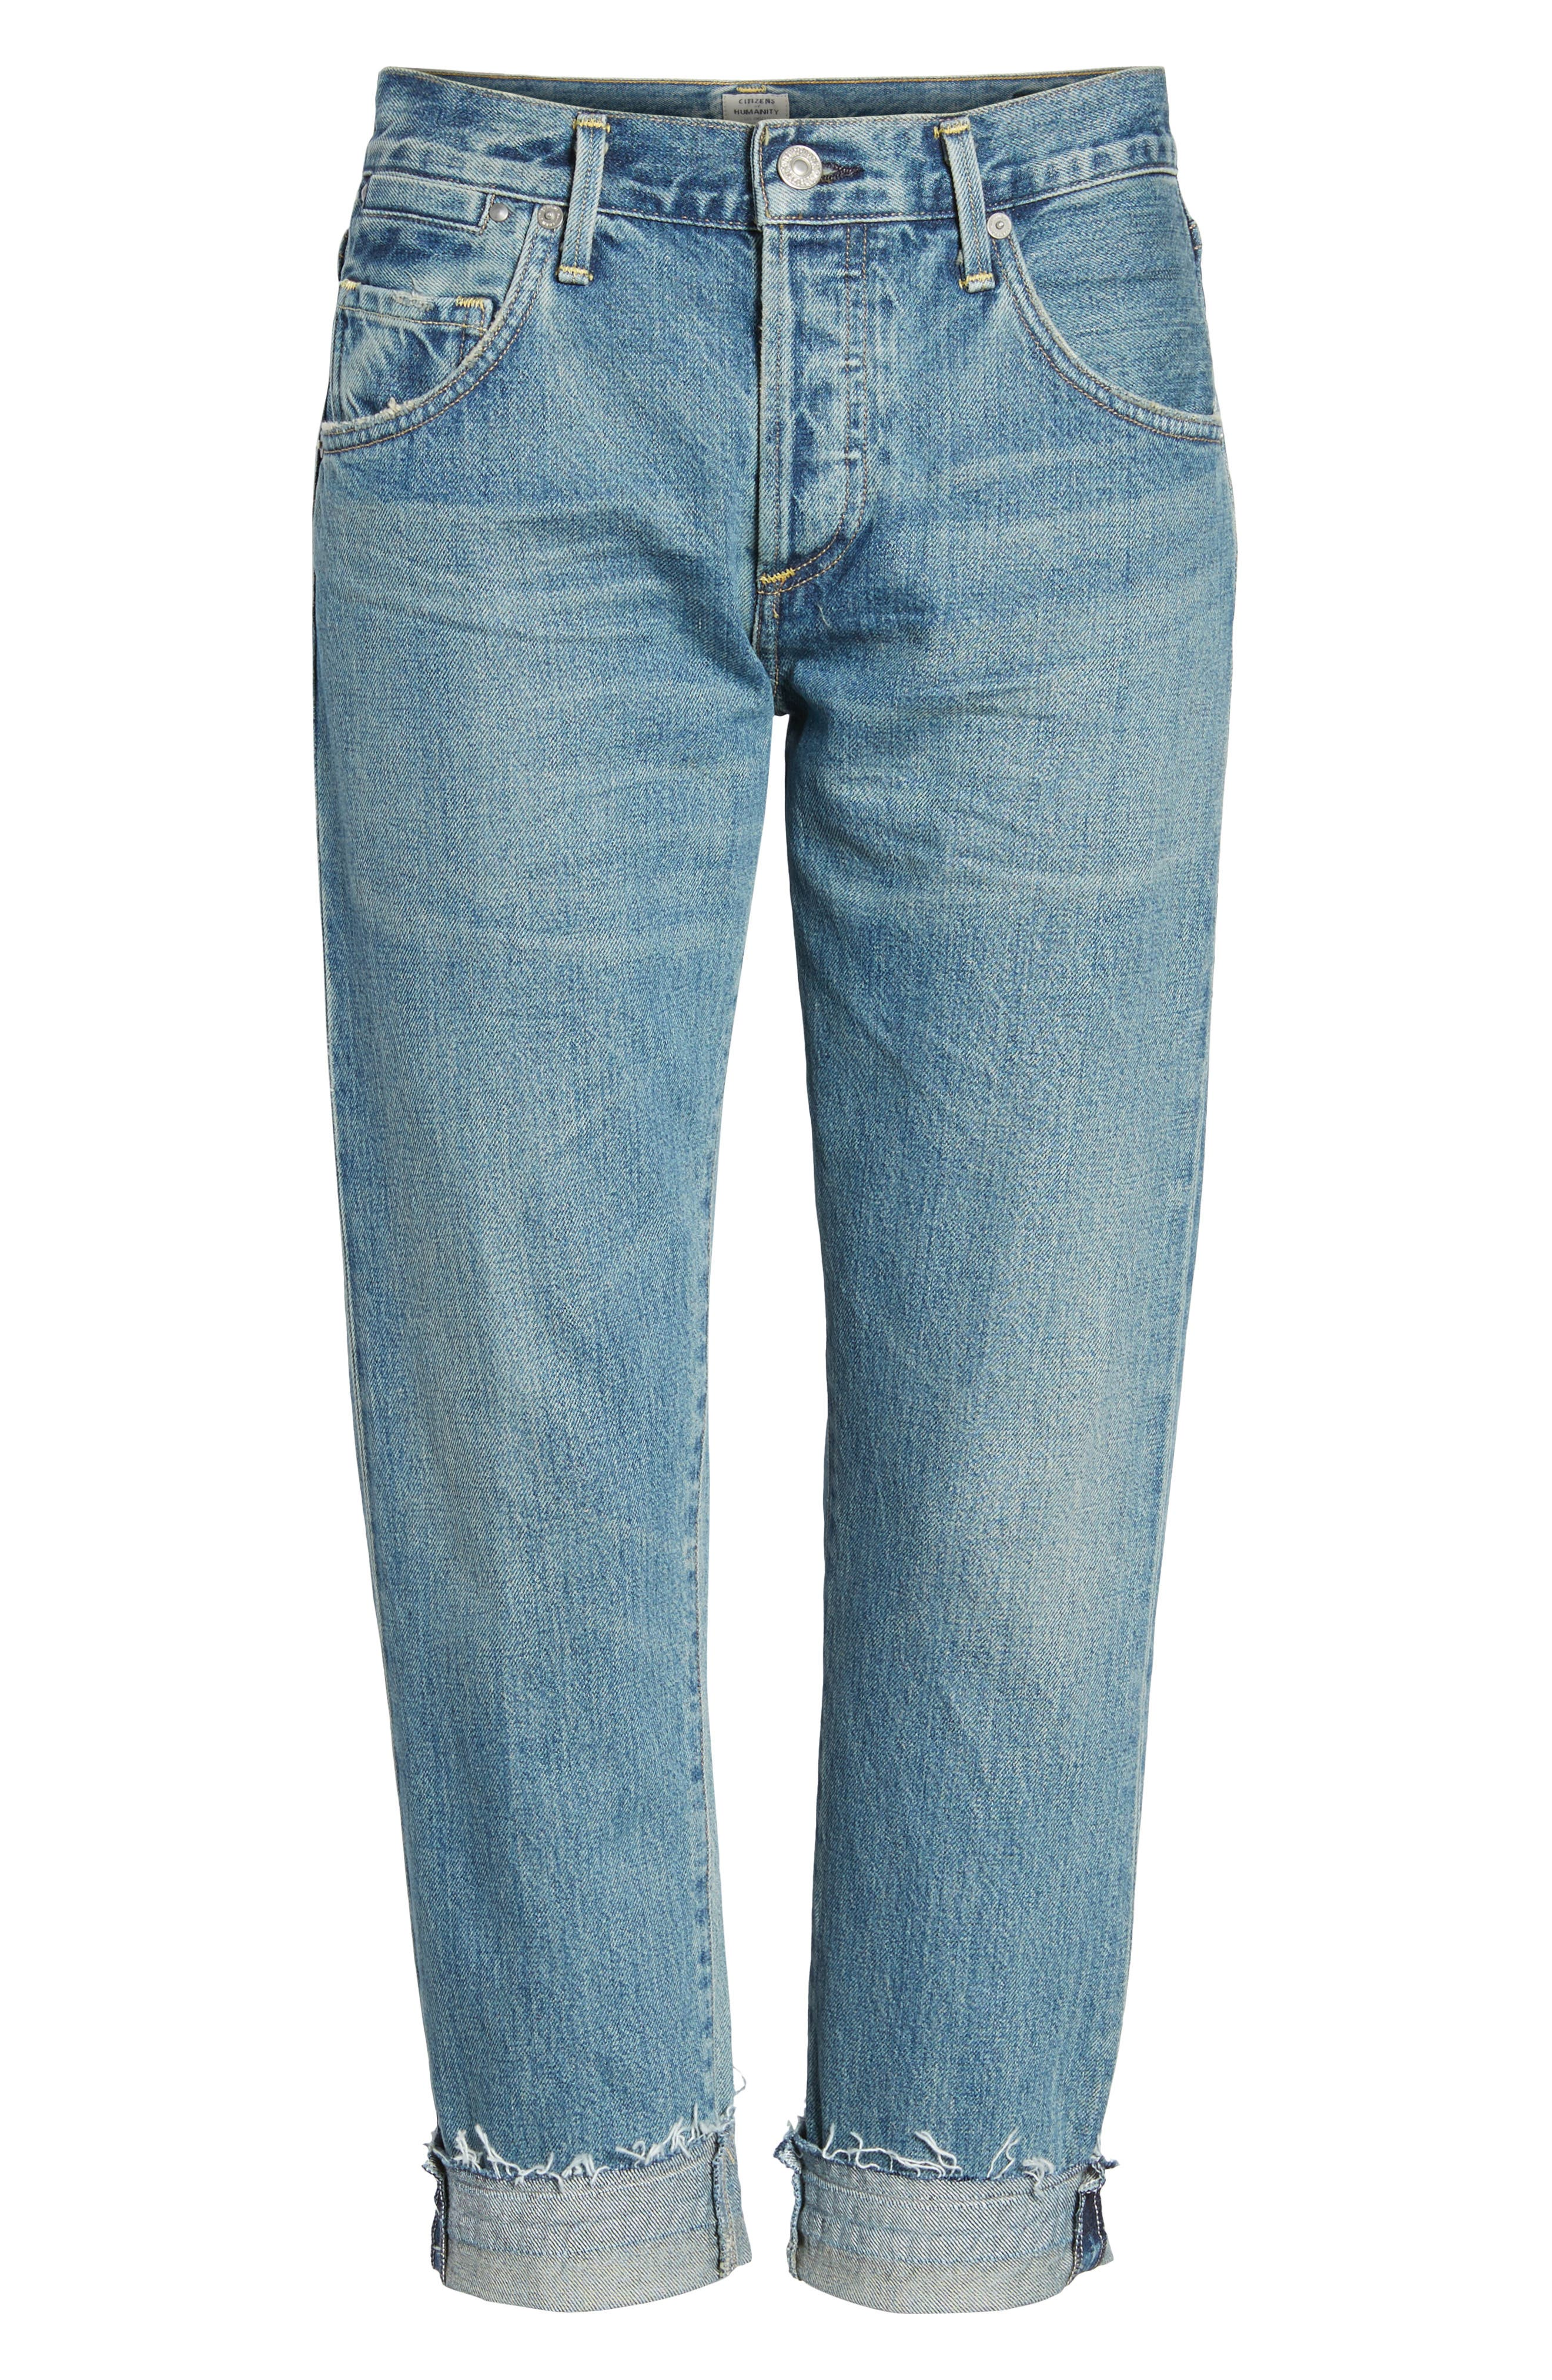 Emerson Crop Slim Boyfriend Jeans,                             Alternate thumbnail 7, color,                             Somerset